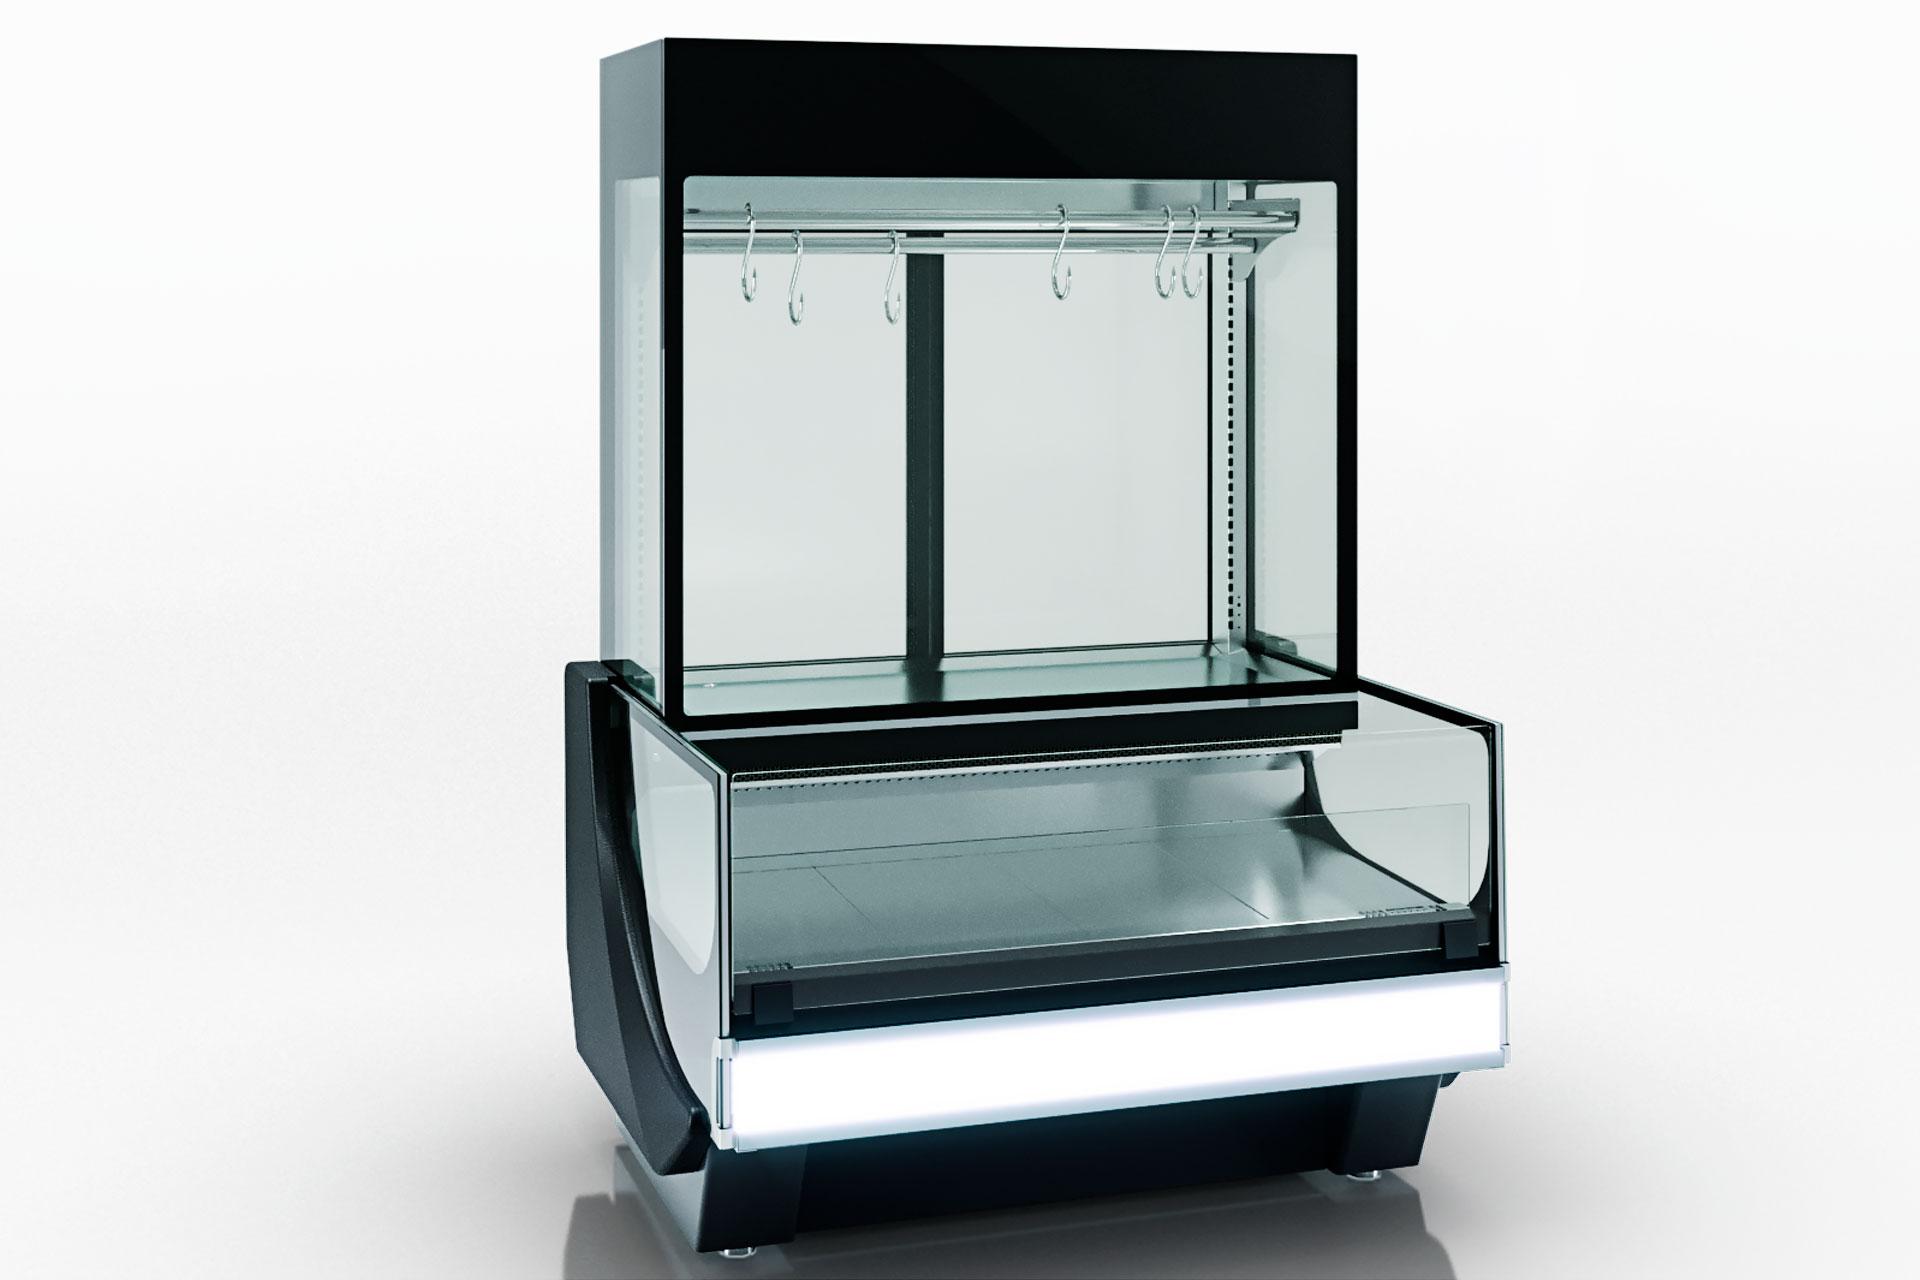 Refrigerated counters Missouri cold diamond MC 115 crystal combi S/self 200-S/DLM / S/DLA